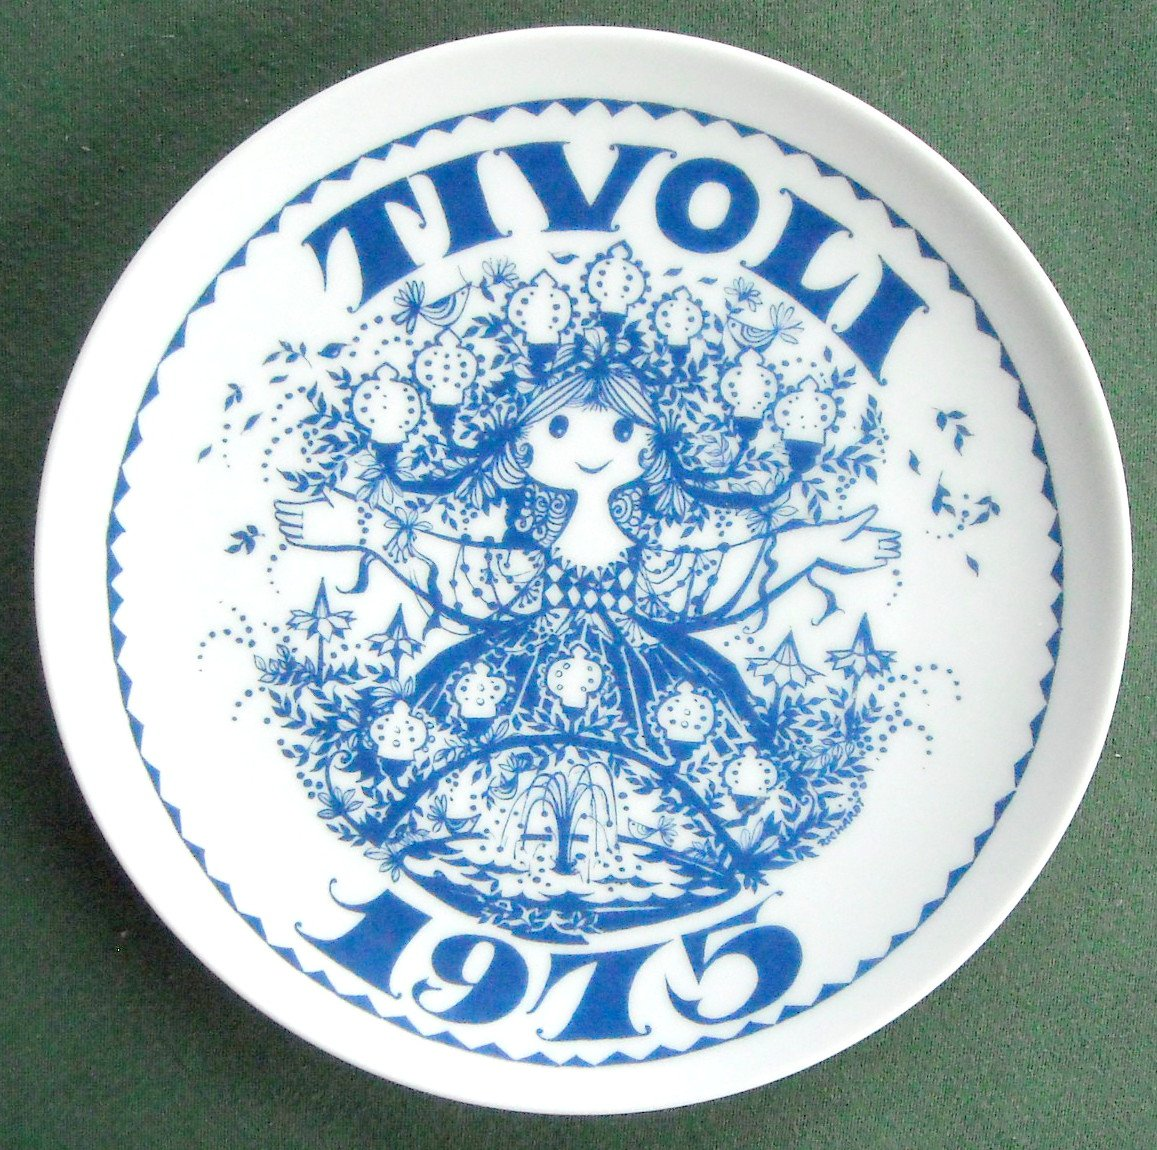 Danish Tivoli Denmark Plate TIVOLI KUPLEN 1975